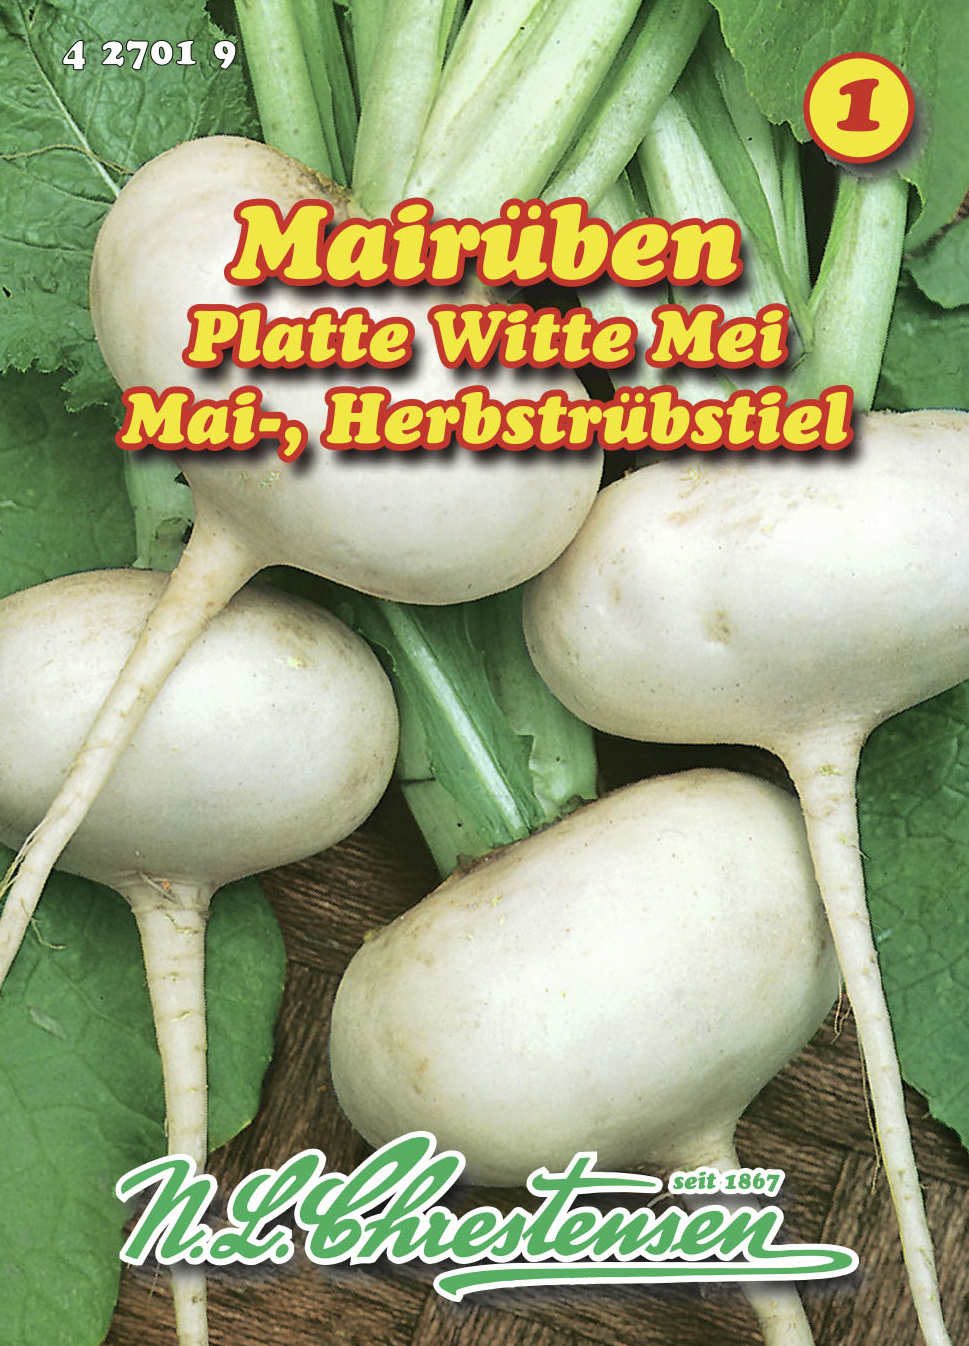 Quedlinburger Mairübe Platte witte Mei